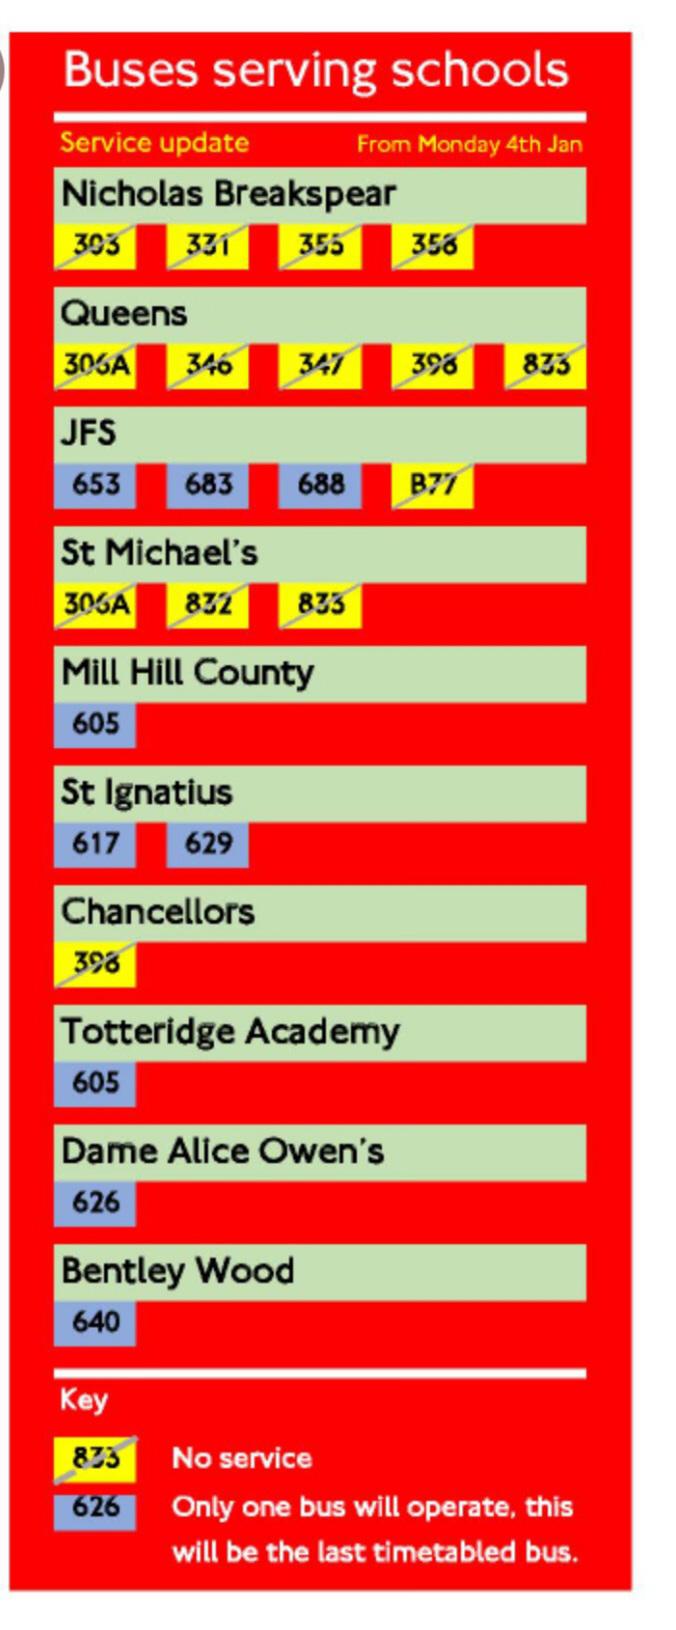 SULLIVAN BUSES SCHOOLS 4-1-21 (J SADD)